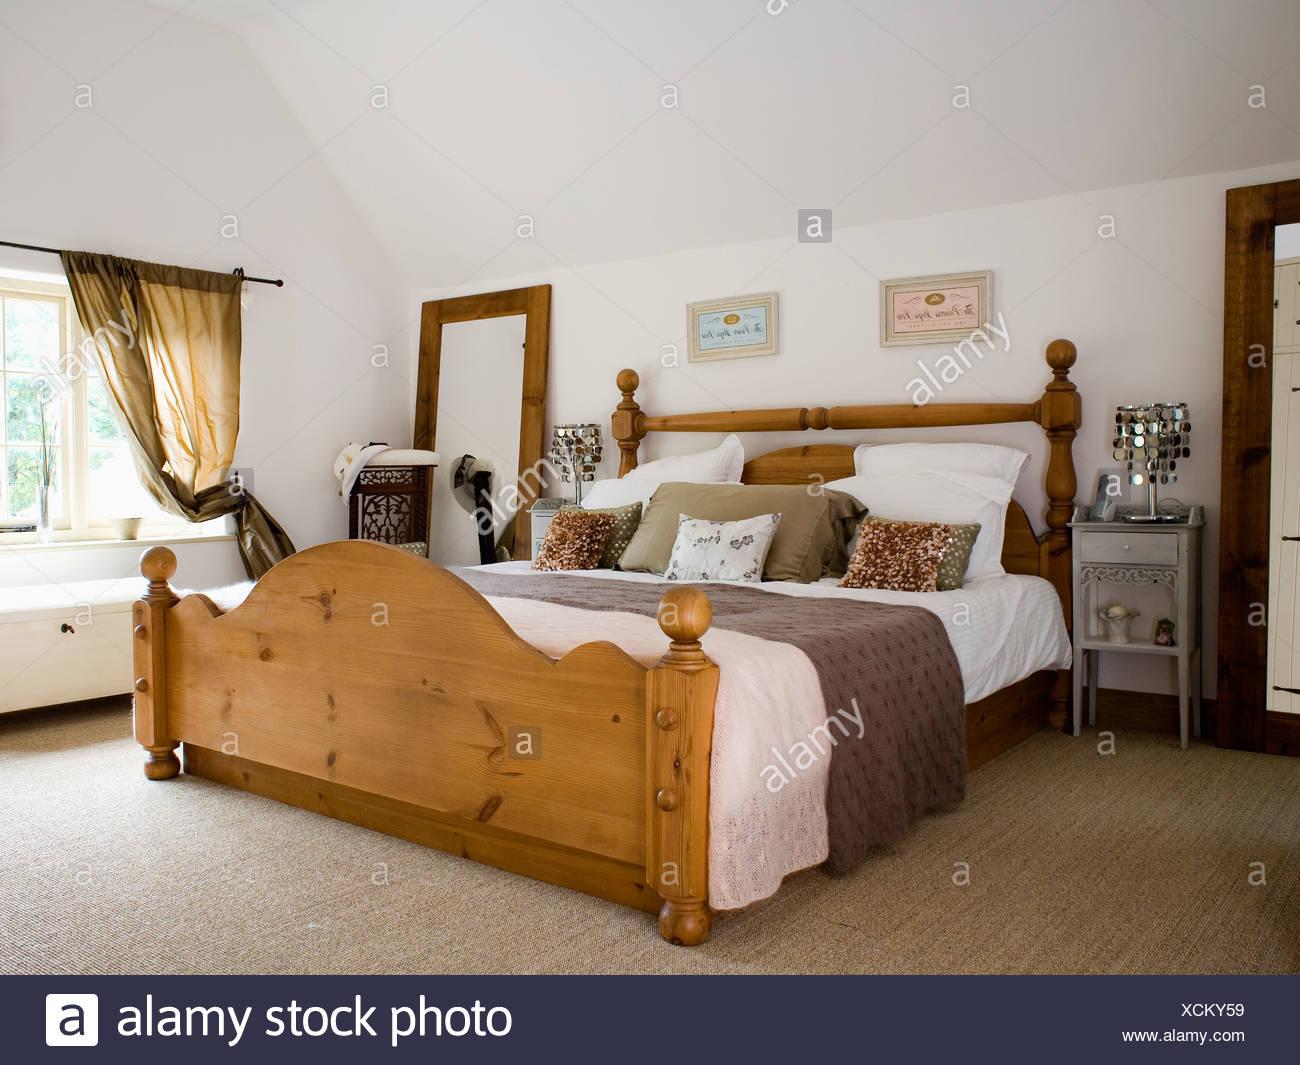 Grand lit avec draps en pin blanc et brun jeter en pays chambre avec ...